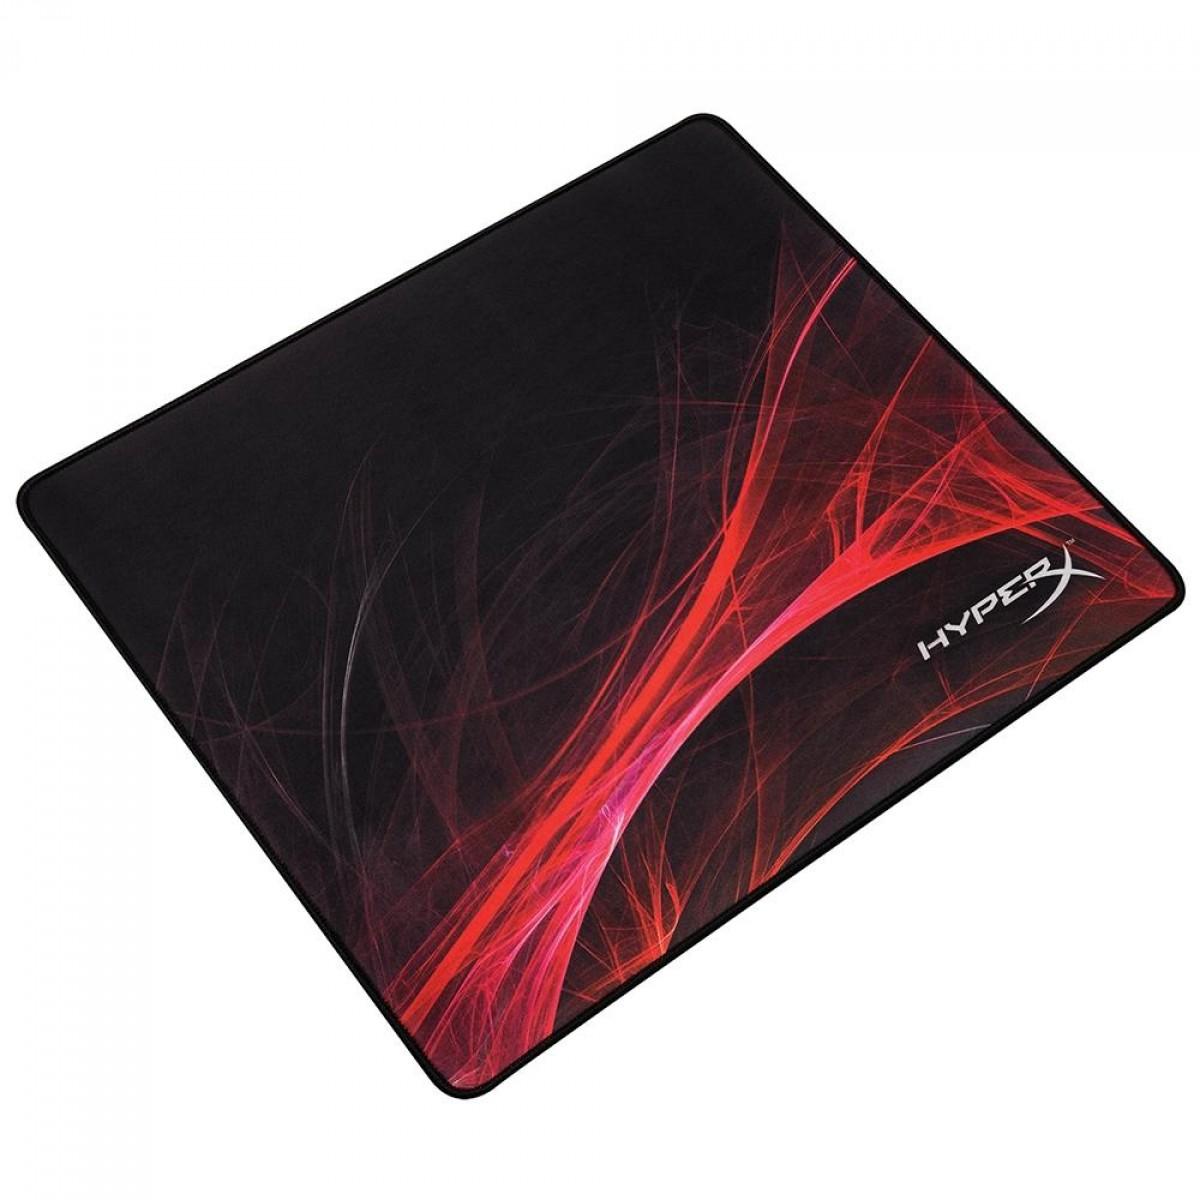 Mousepad Gamer HyperX Fury S Speed, Black, Grande (450x400mm), HX-MPFS-S-L